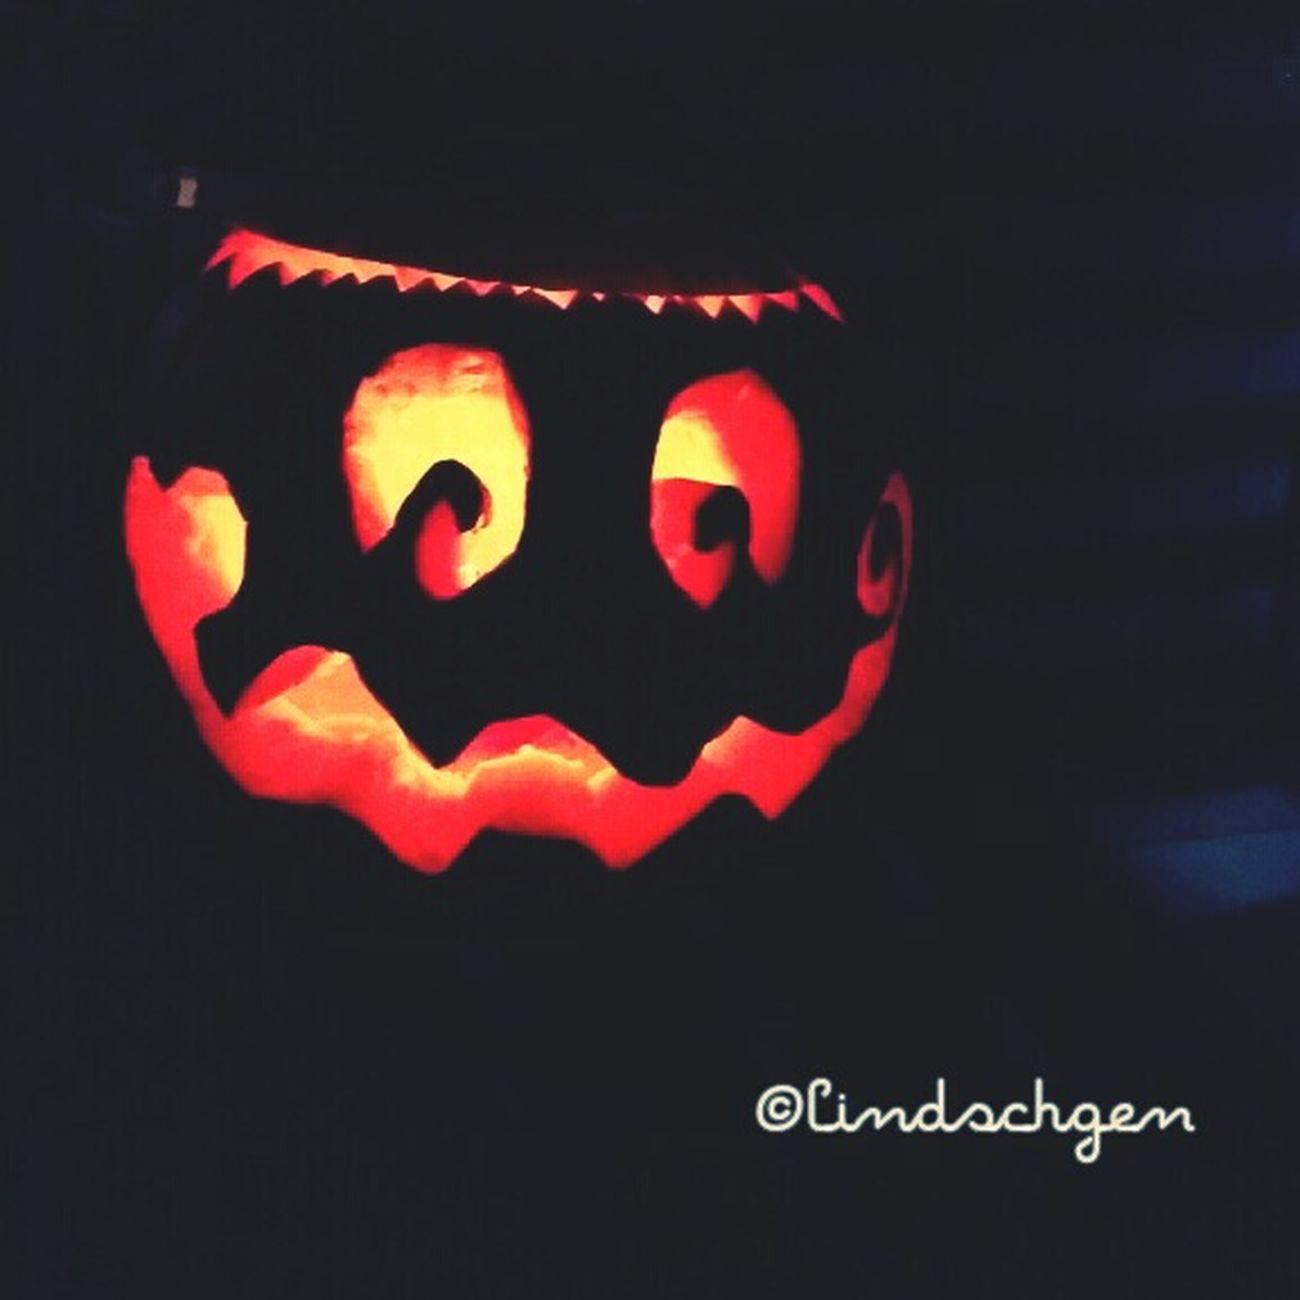 Mein erster geschnizter Kürbis 🎃 my first self craved pumkin Halloween Pumpkin Pumkin Carving Pumkins Kürbis Halloween2015 Halloween Pumpkins Pumkinpicking🎃 Selfmade EyeEm Gallery Enjoying Life Glücklich ☺️ Balkonglück